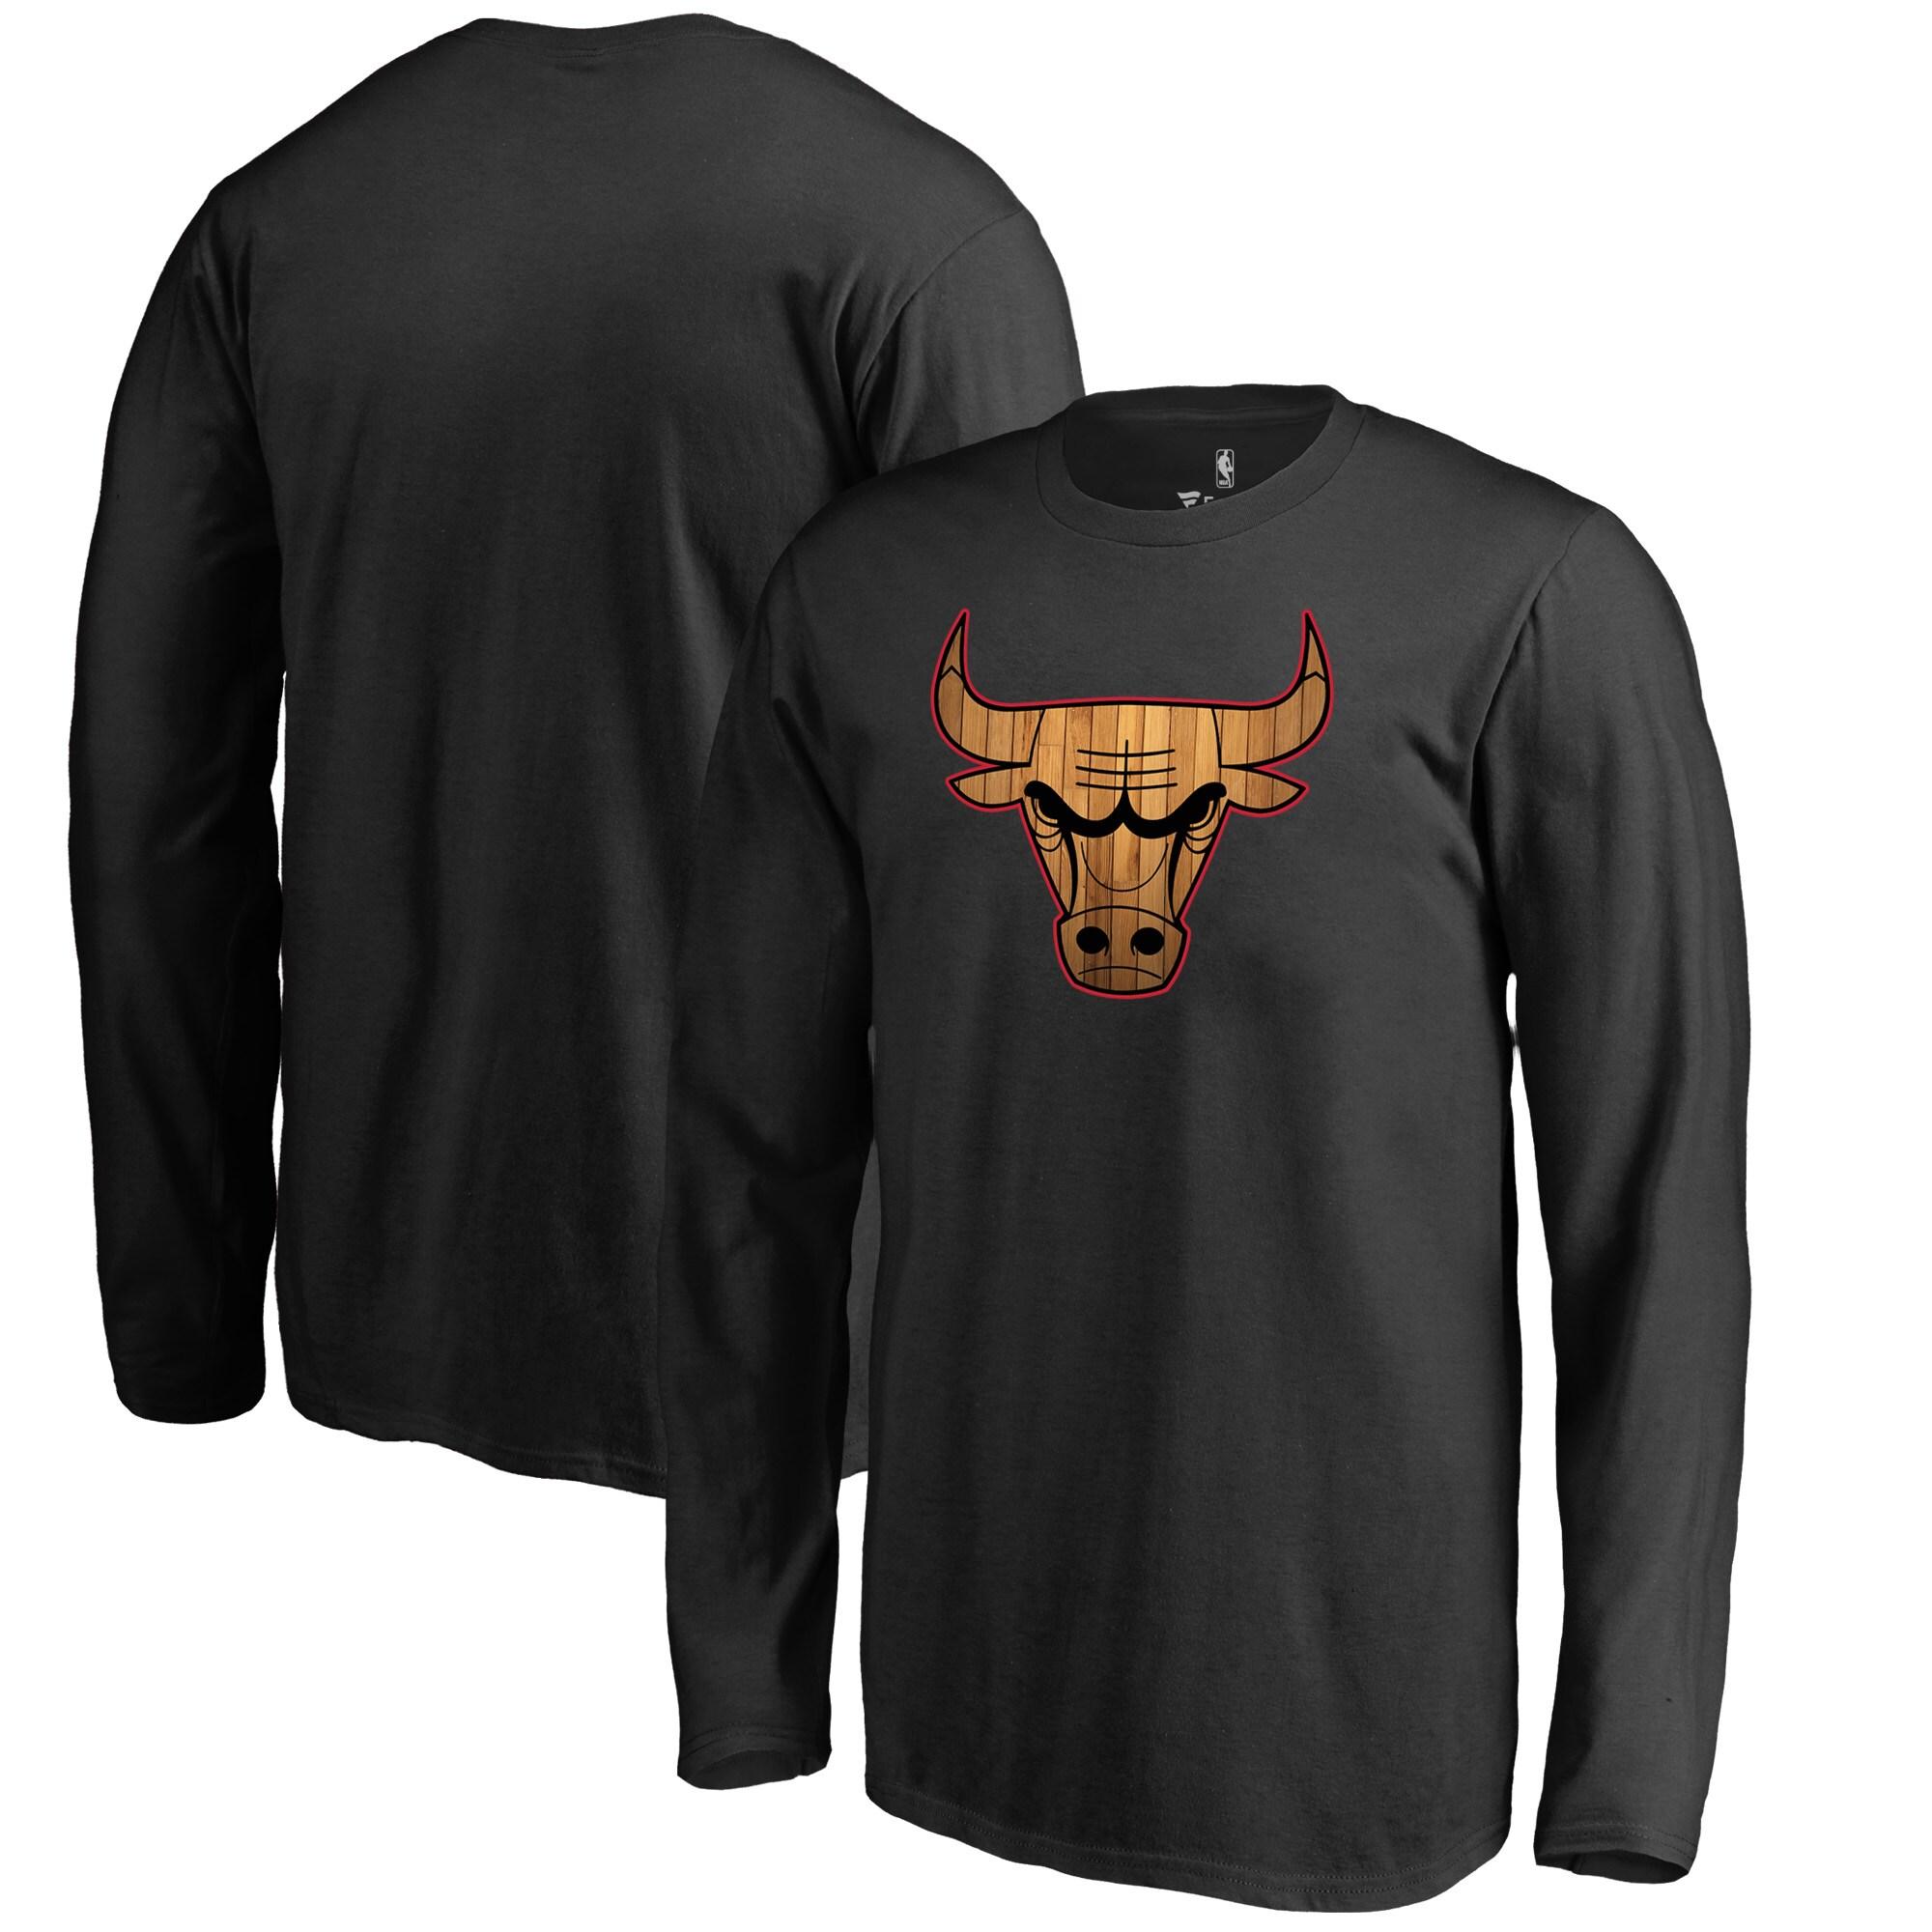 Chicago Bulls Fanatics Branded Youth Hardwood Long Sleeve T-Shirt - Black